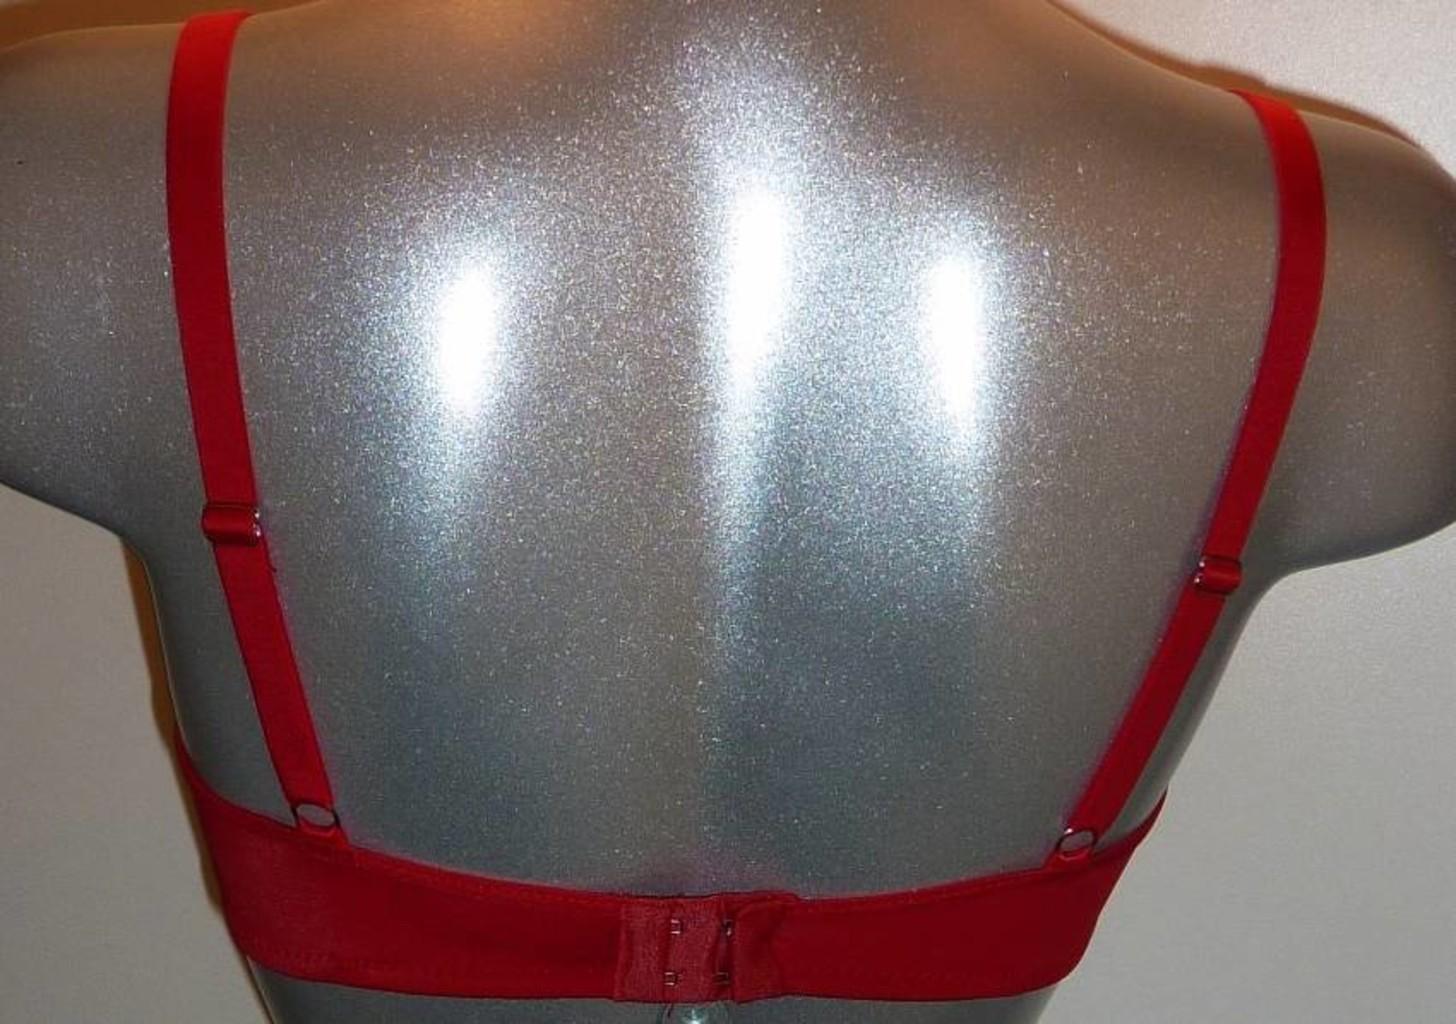 Sapph Sapph Fortuny Bh met licht voorgevormde cup kleur rood mt A70,B70 & C70